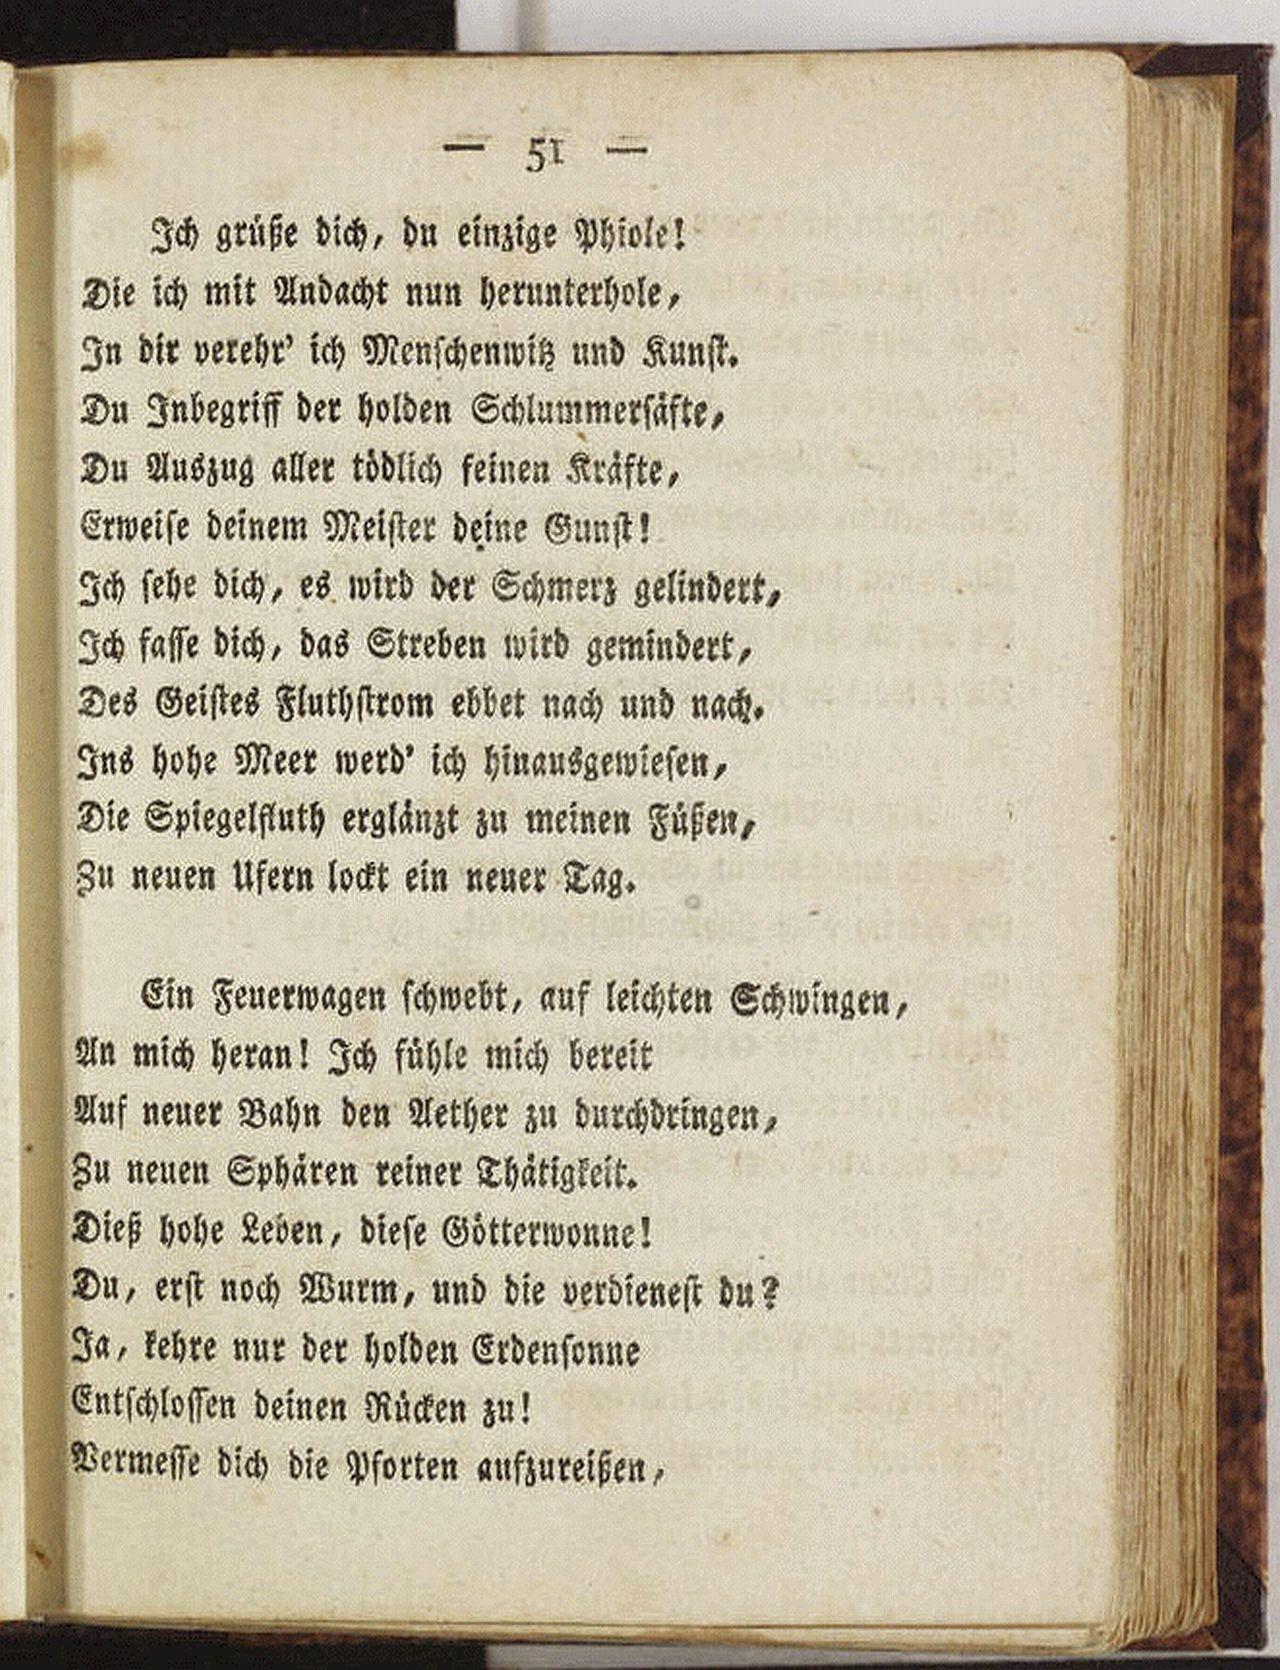 Faust essay questions